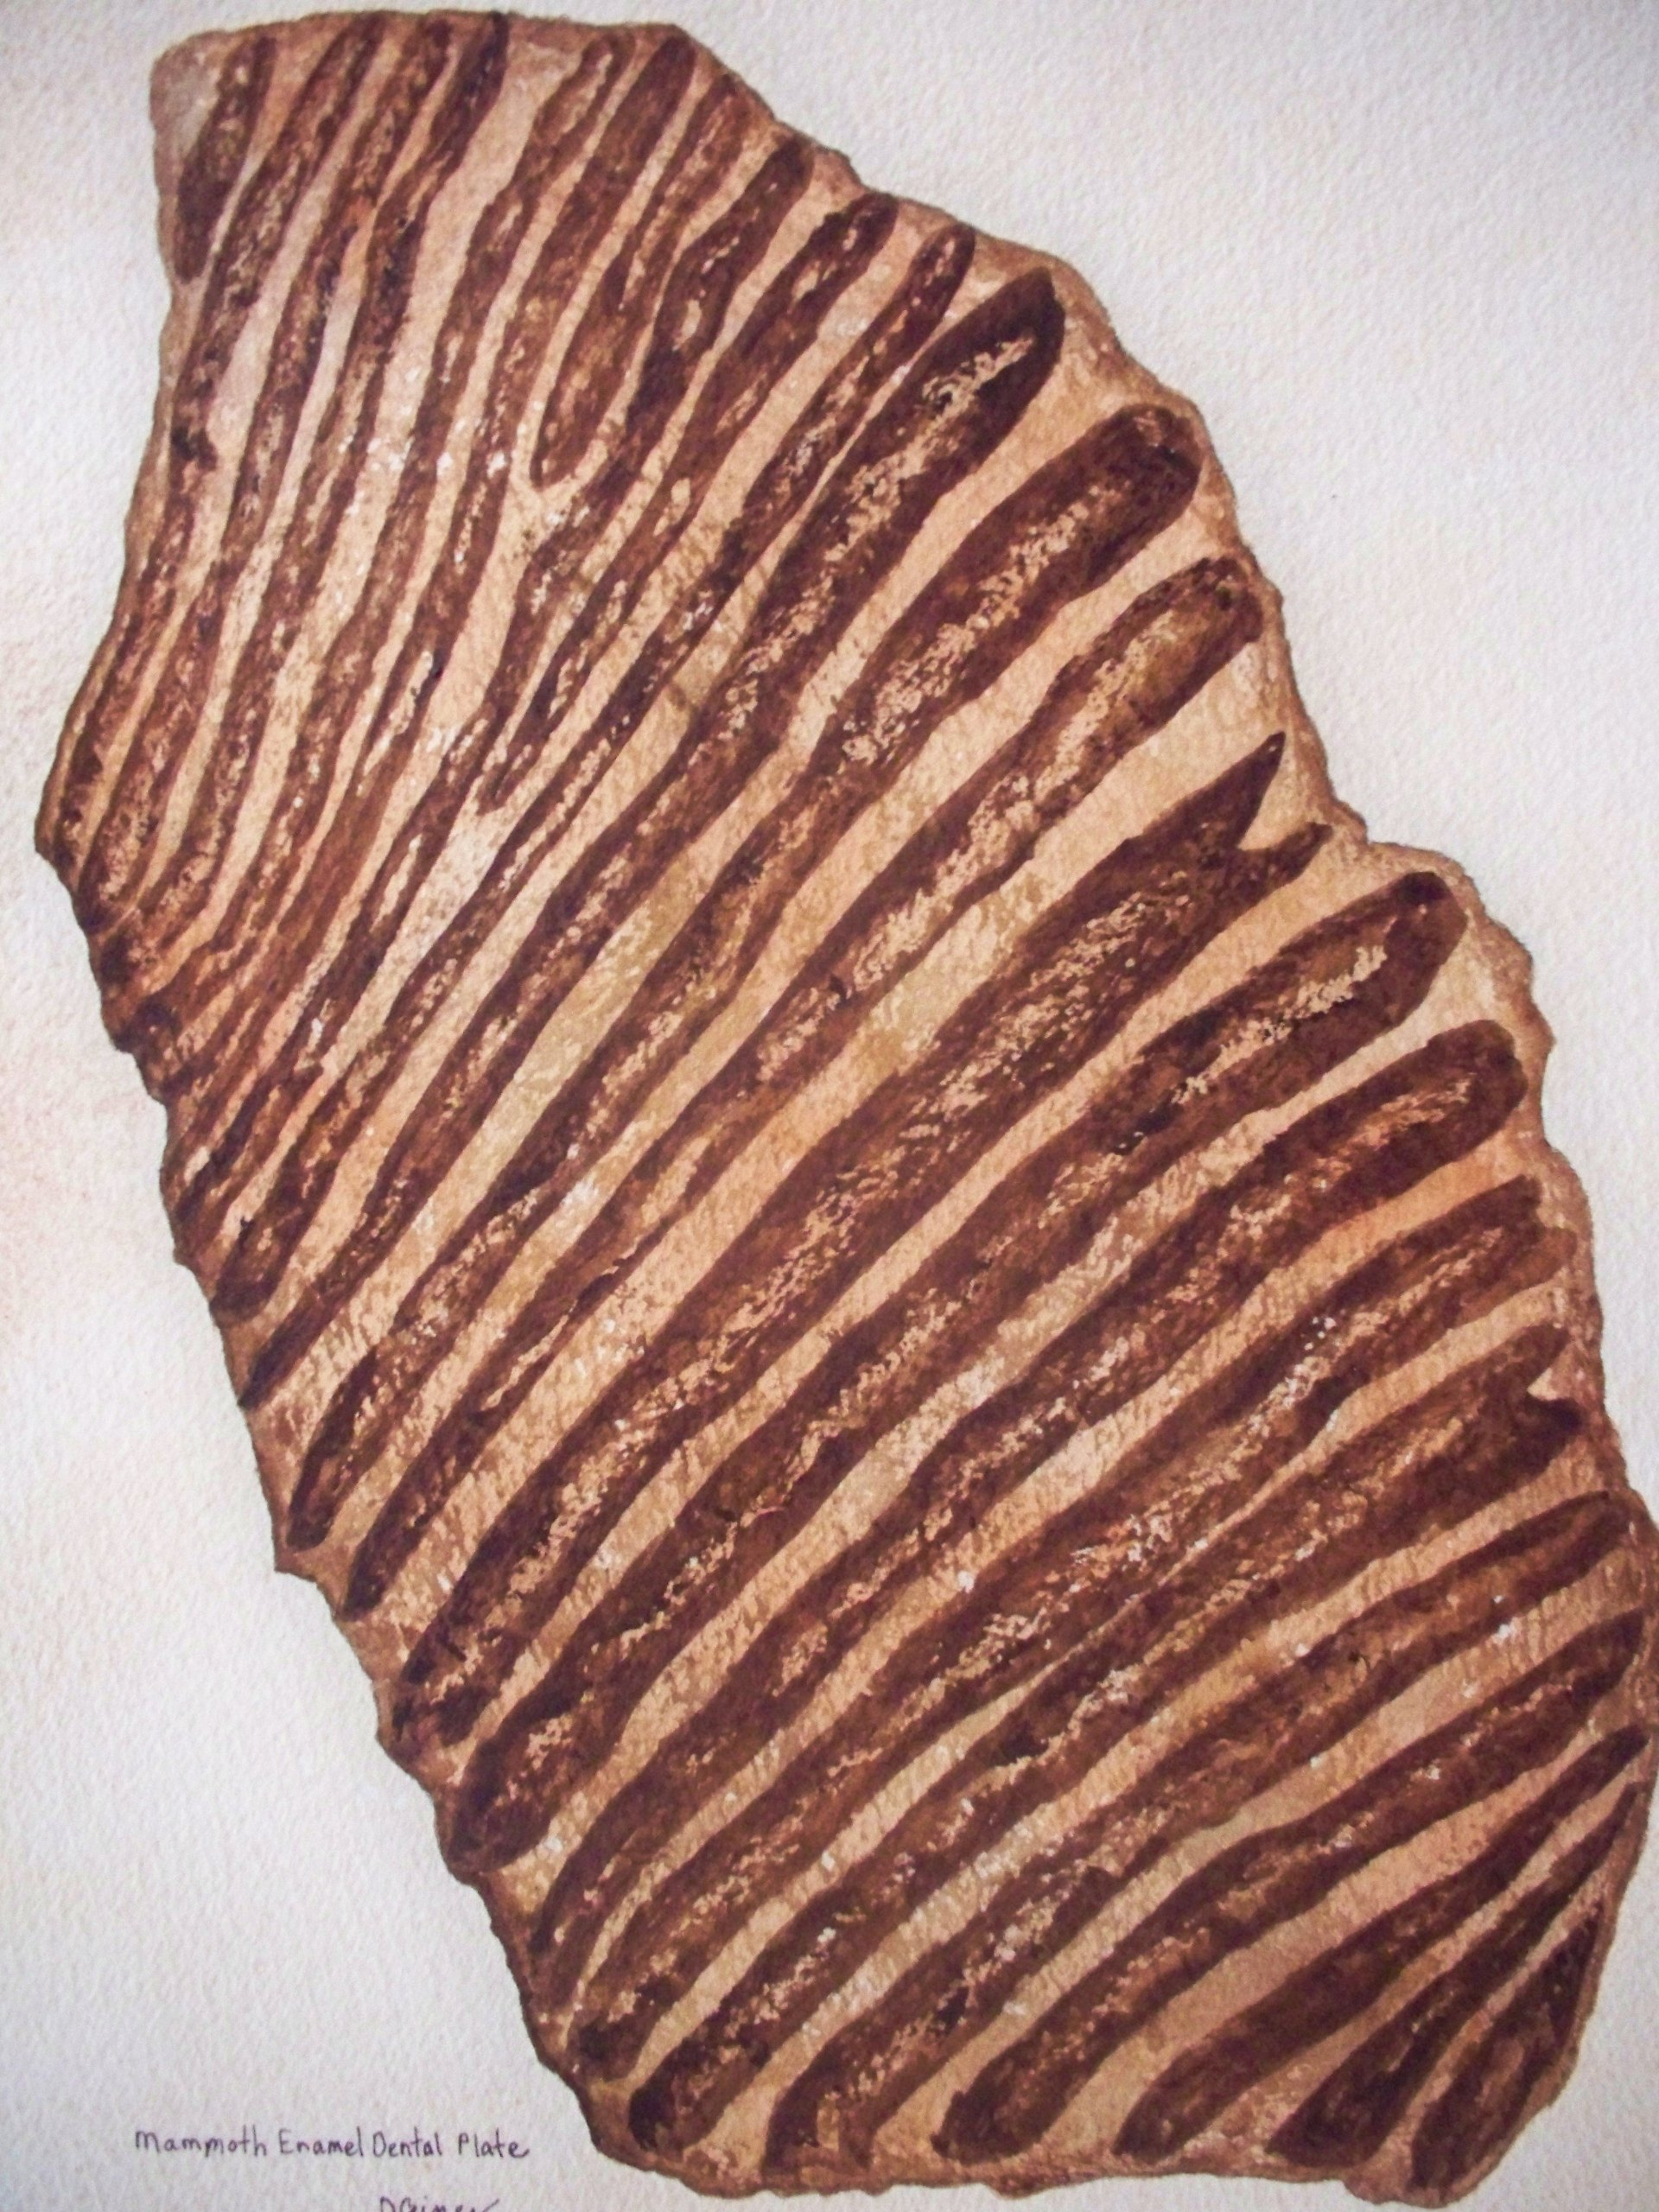 Mammoth Enamel Dental Plate by